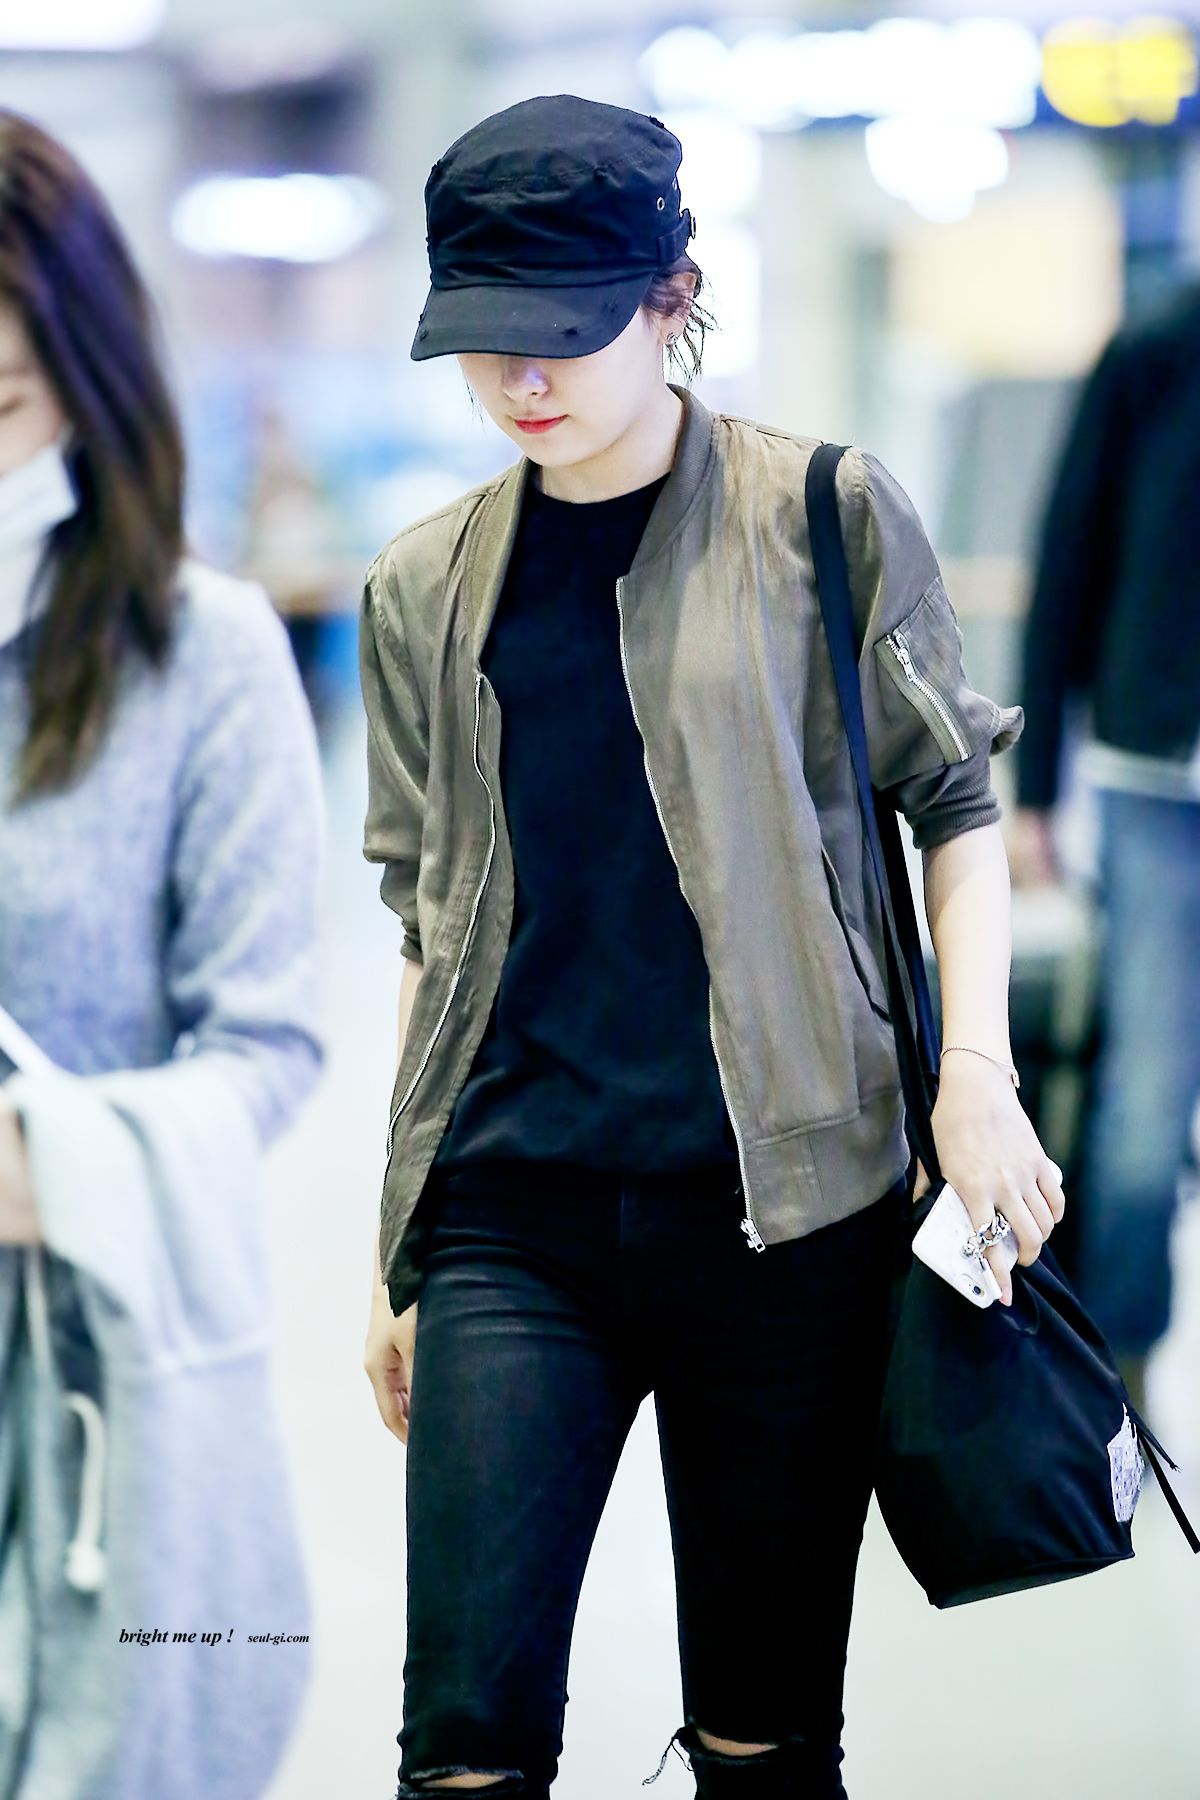 Seulgi Fashion Seulgi Airport Fashion Seulgi Airport 2016 Red Velvet Seulgi 2016 Seulgi Outfi Korean Airport Fashion Red Velvet Seulgi Airport Fashion Kpop